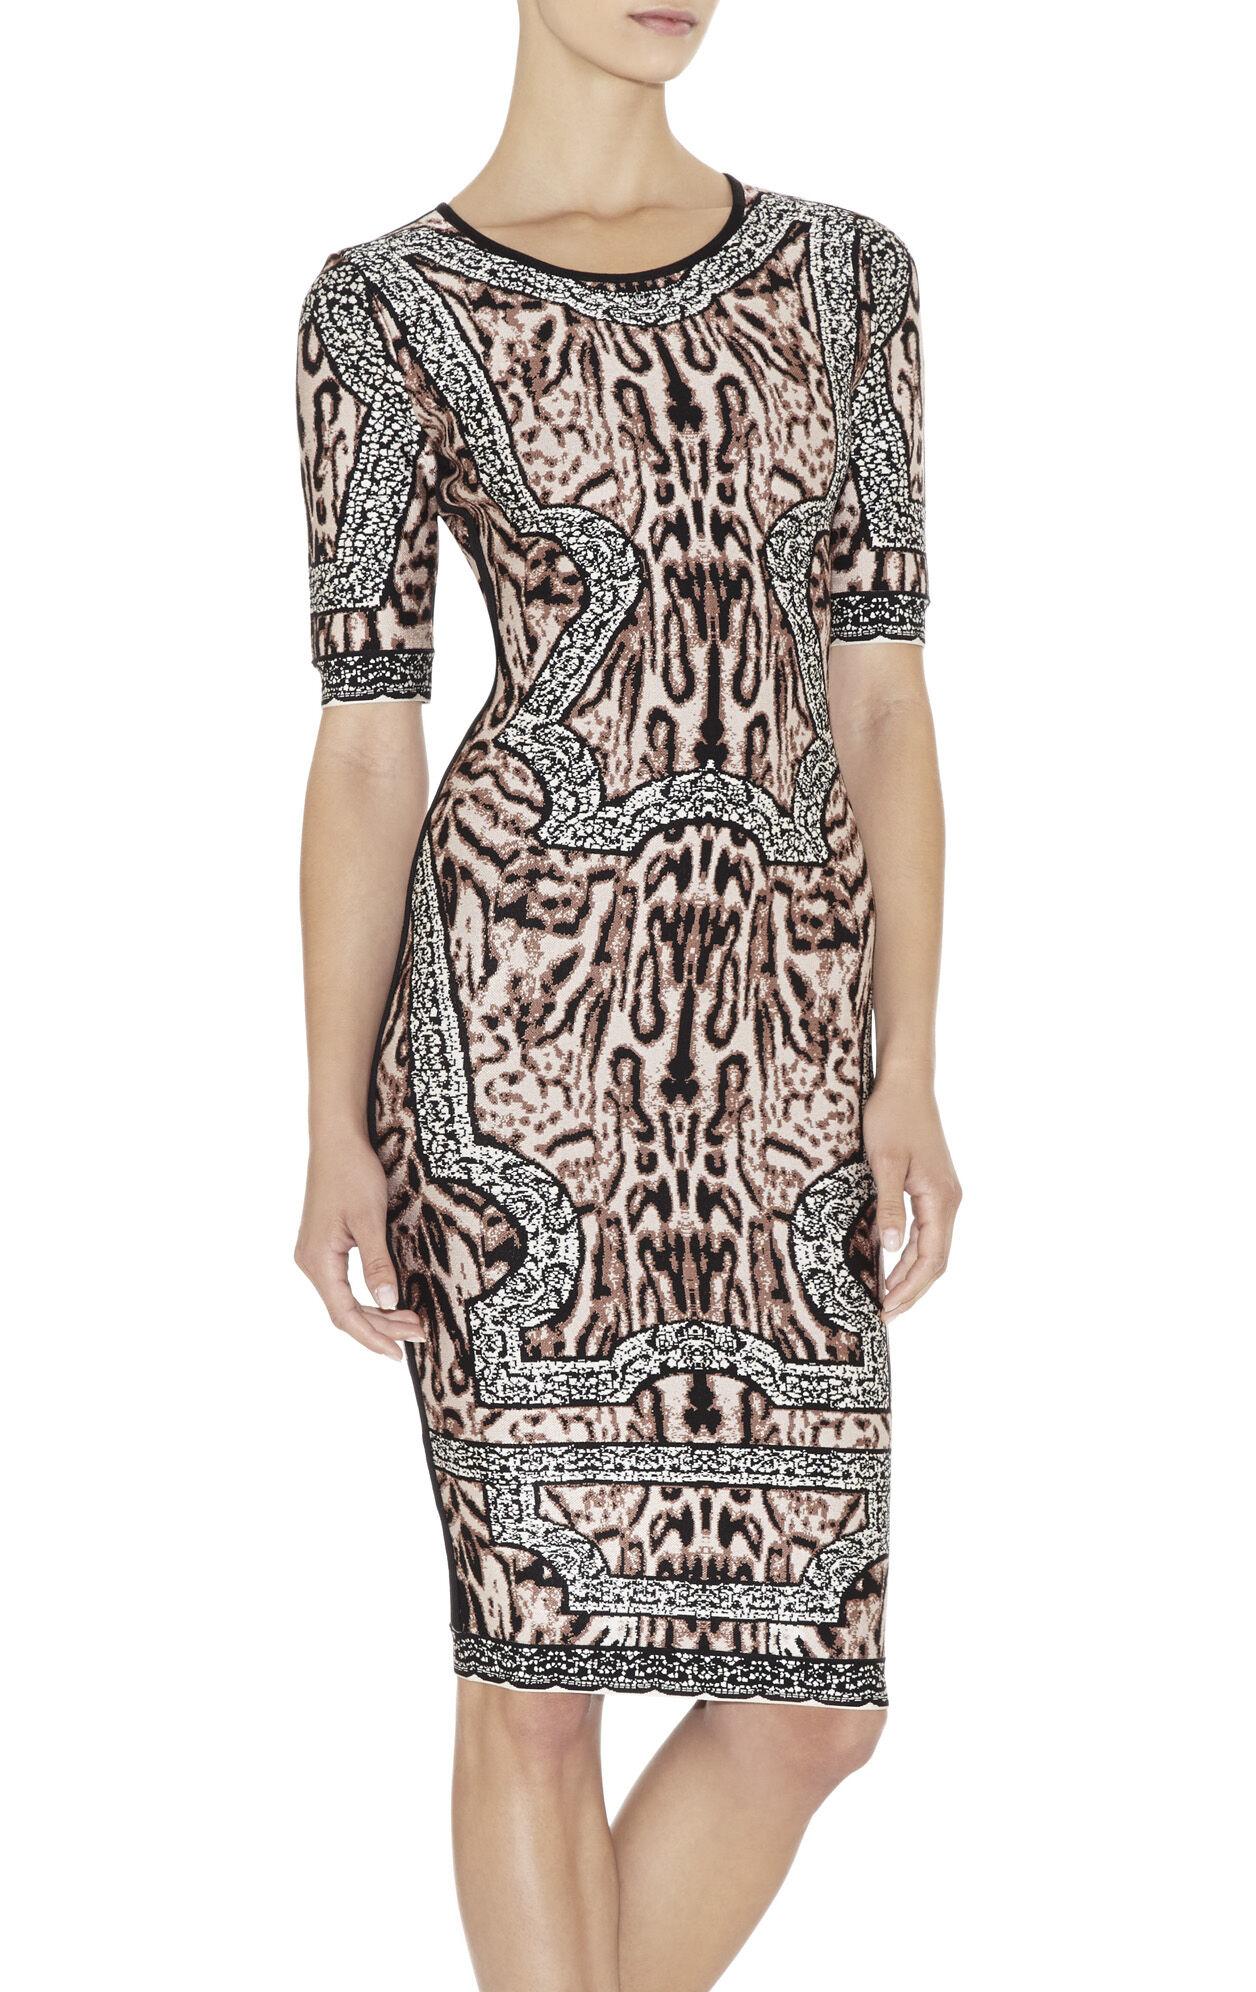 Zola Ocelot and Antique-Lace Jacquard Dress